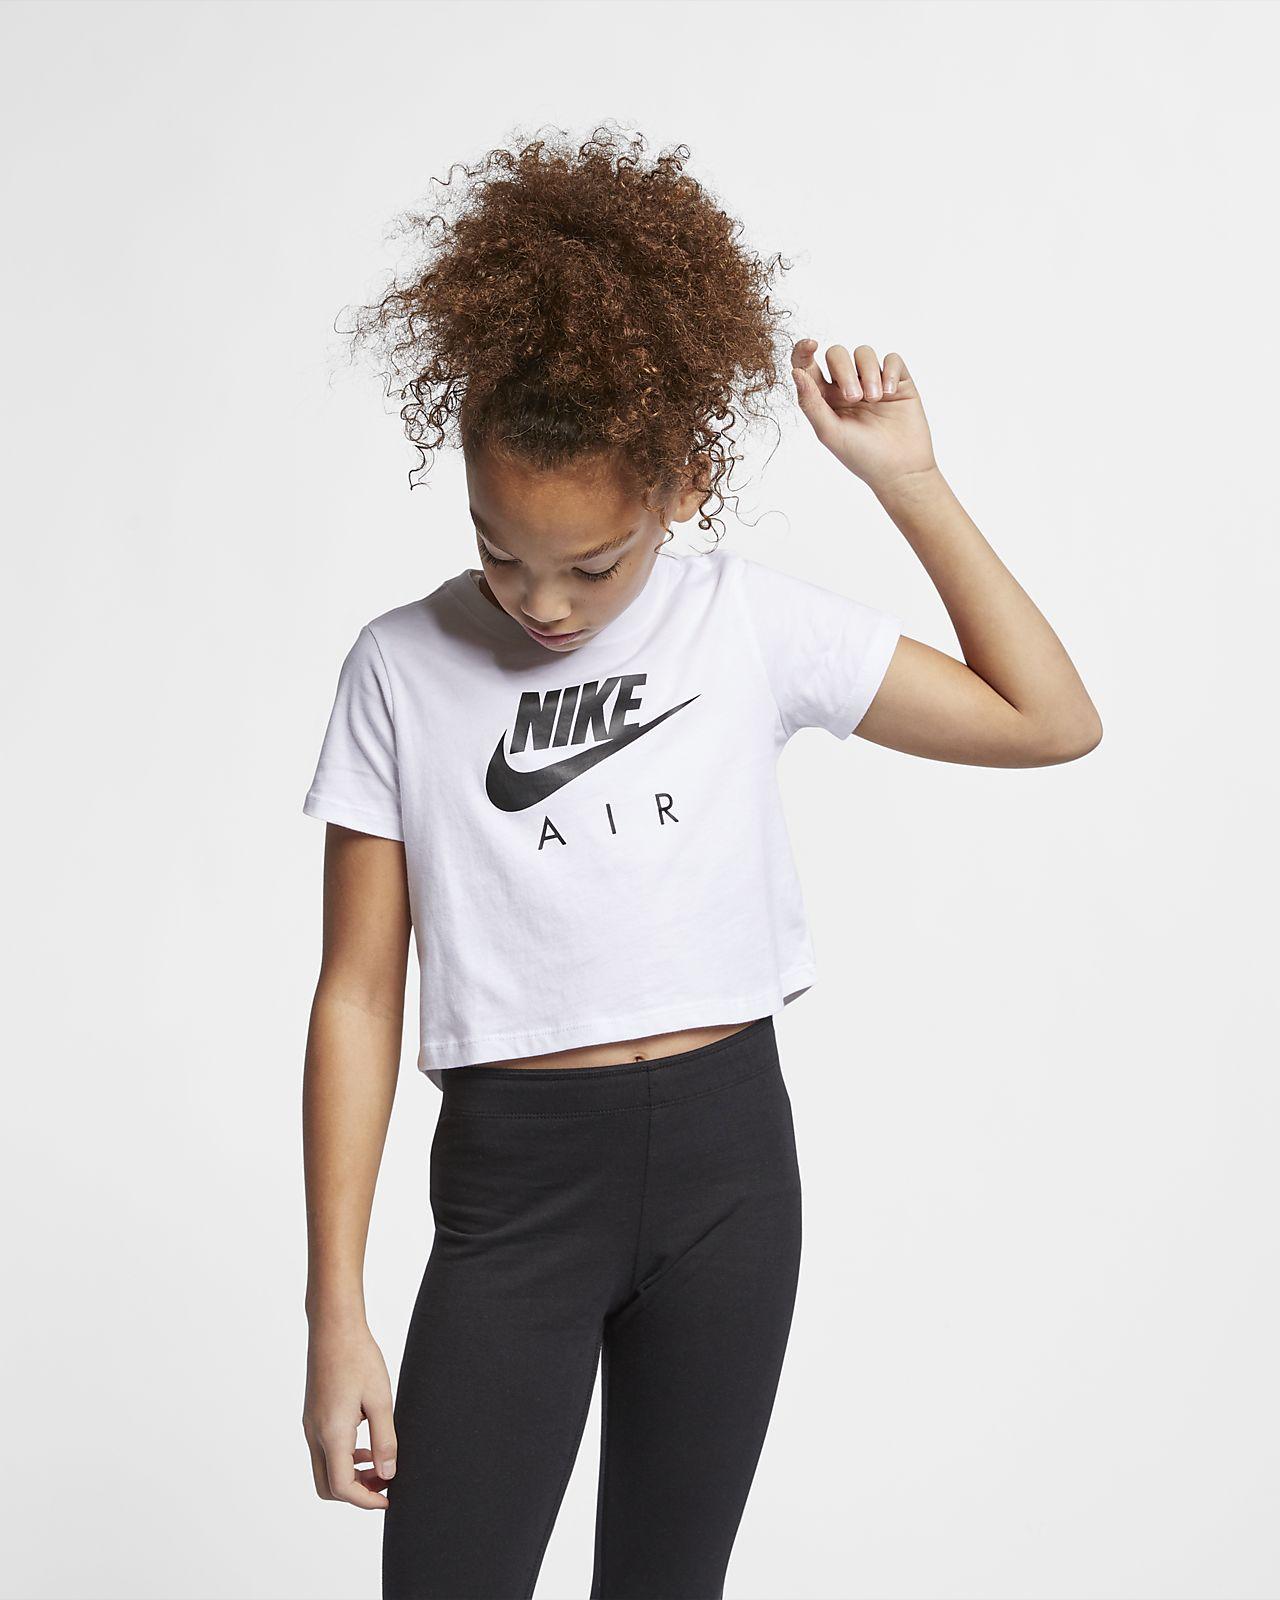 Nike Air Camiseta corta - Niña